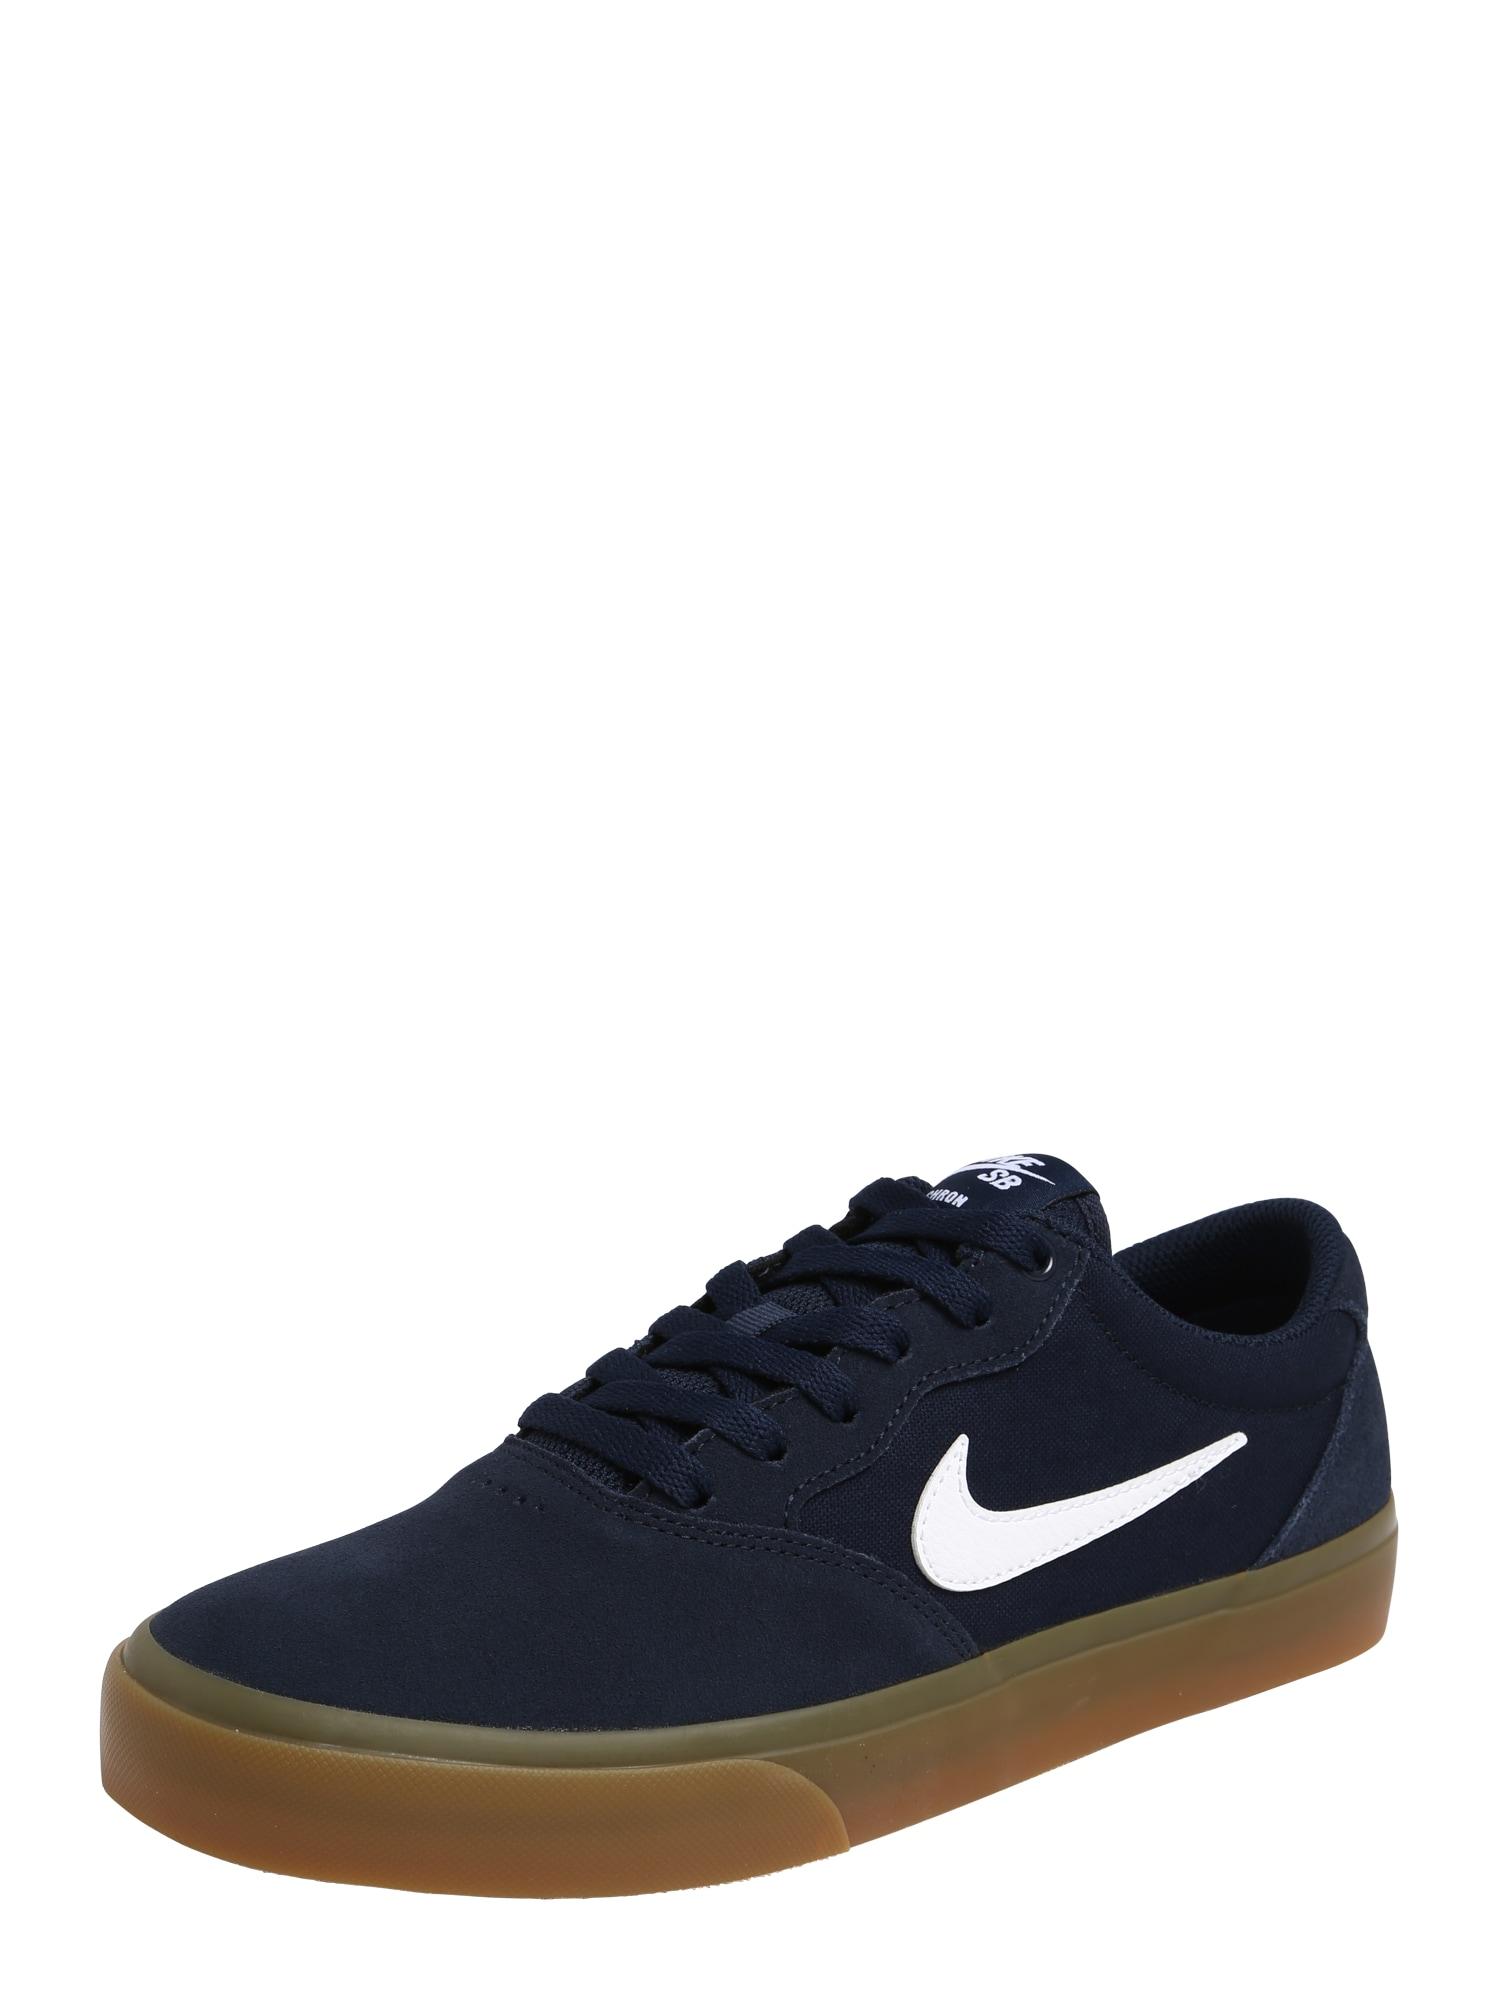 Tenisky Chron námořnická modř bílá Nike SB